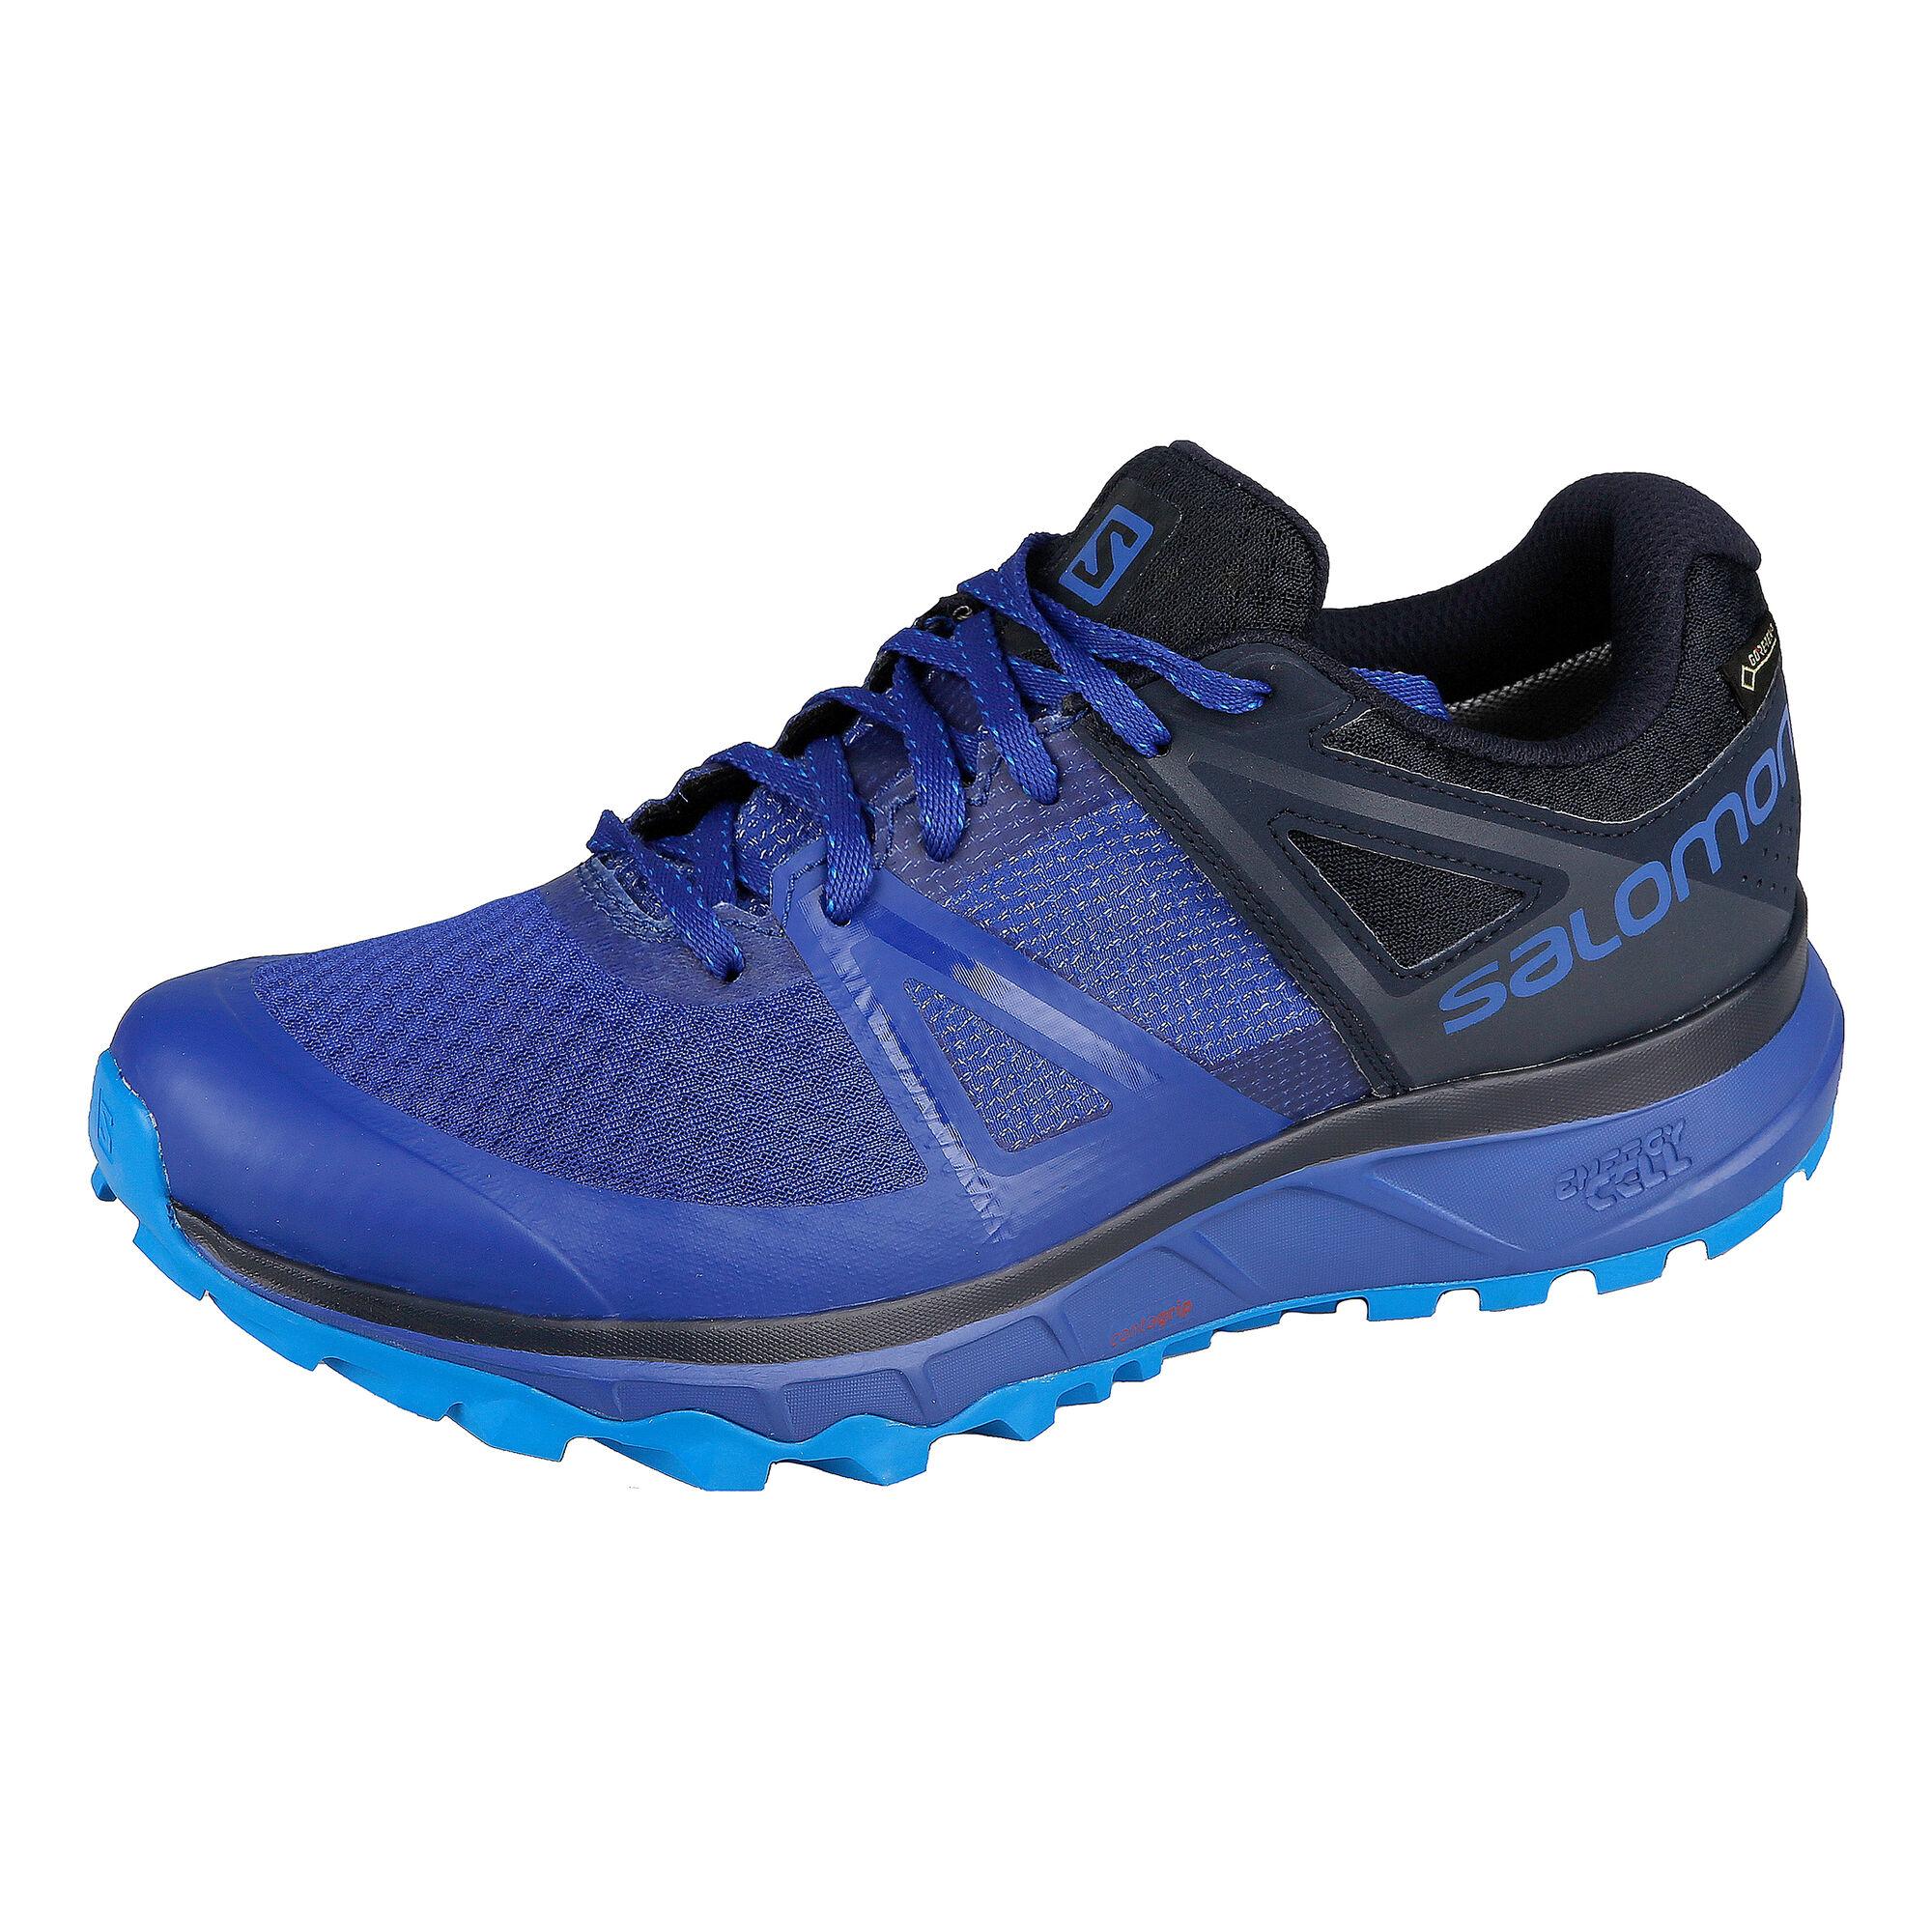 a31fdfb8389 buy Salomon Trailster GTX Trail Running Shoe Men - Dark Blue